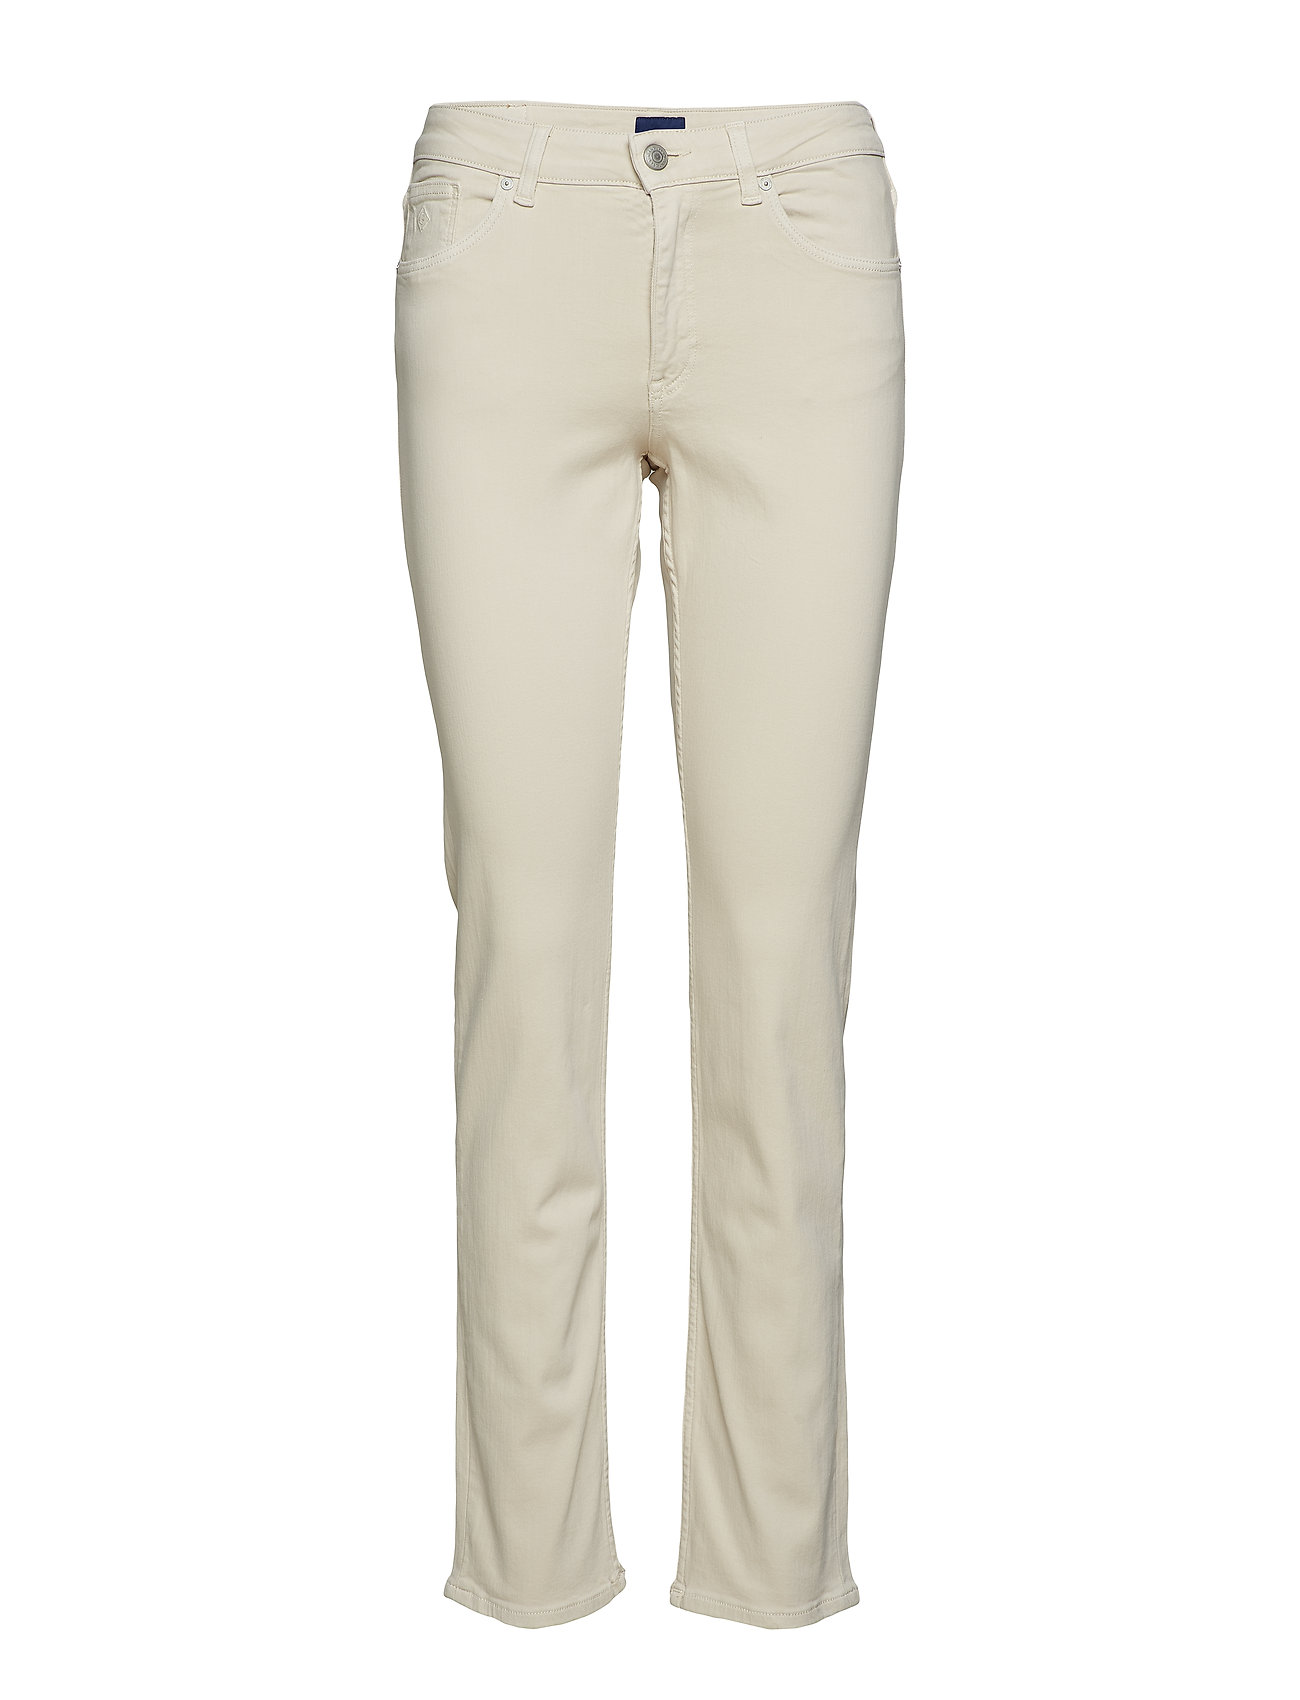 GANT - SLIM TWILL JEANS - slim jeans - putty - 0